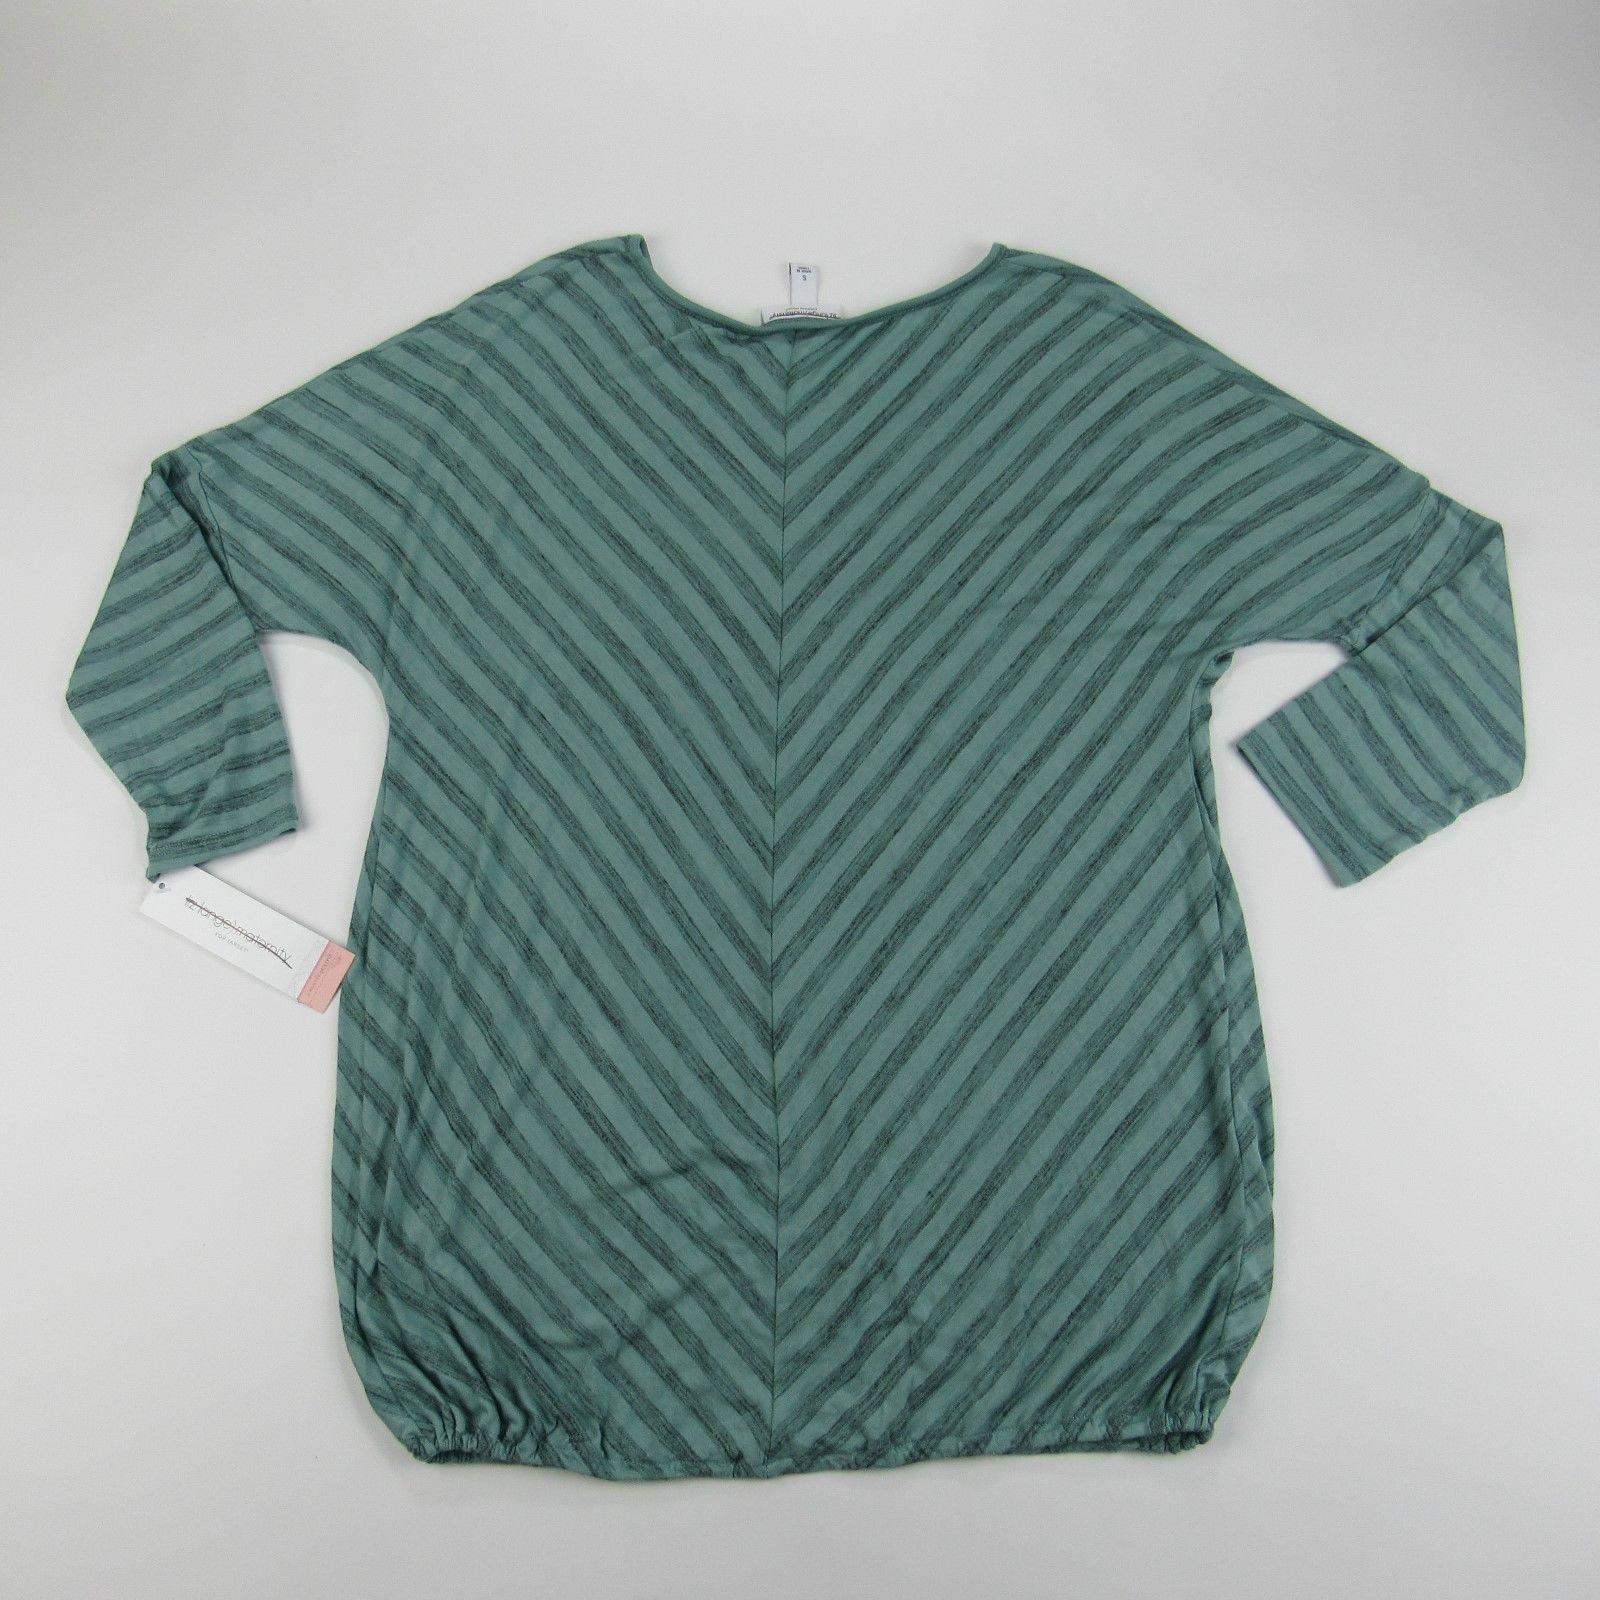 860962fe3e64e Liz Lange for Target Maternity Blouse Top and 50 similar items